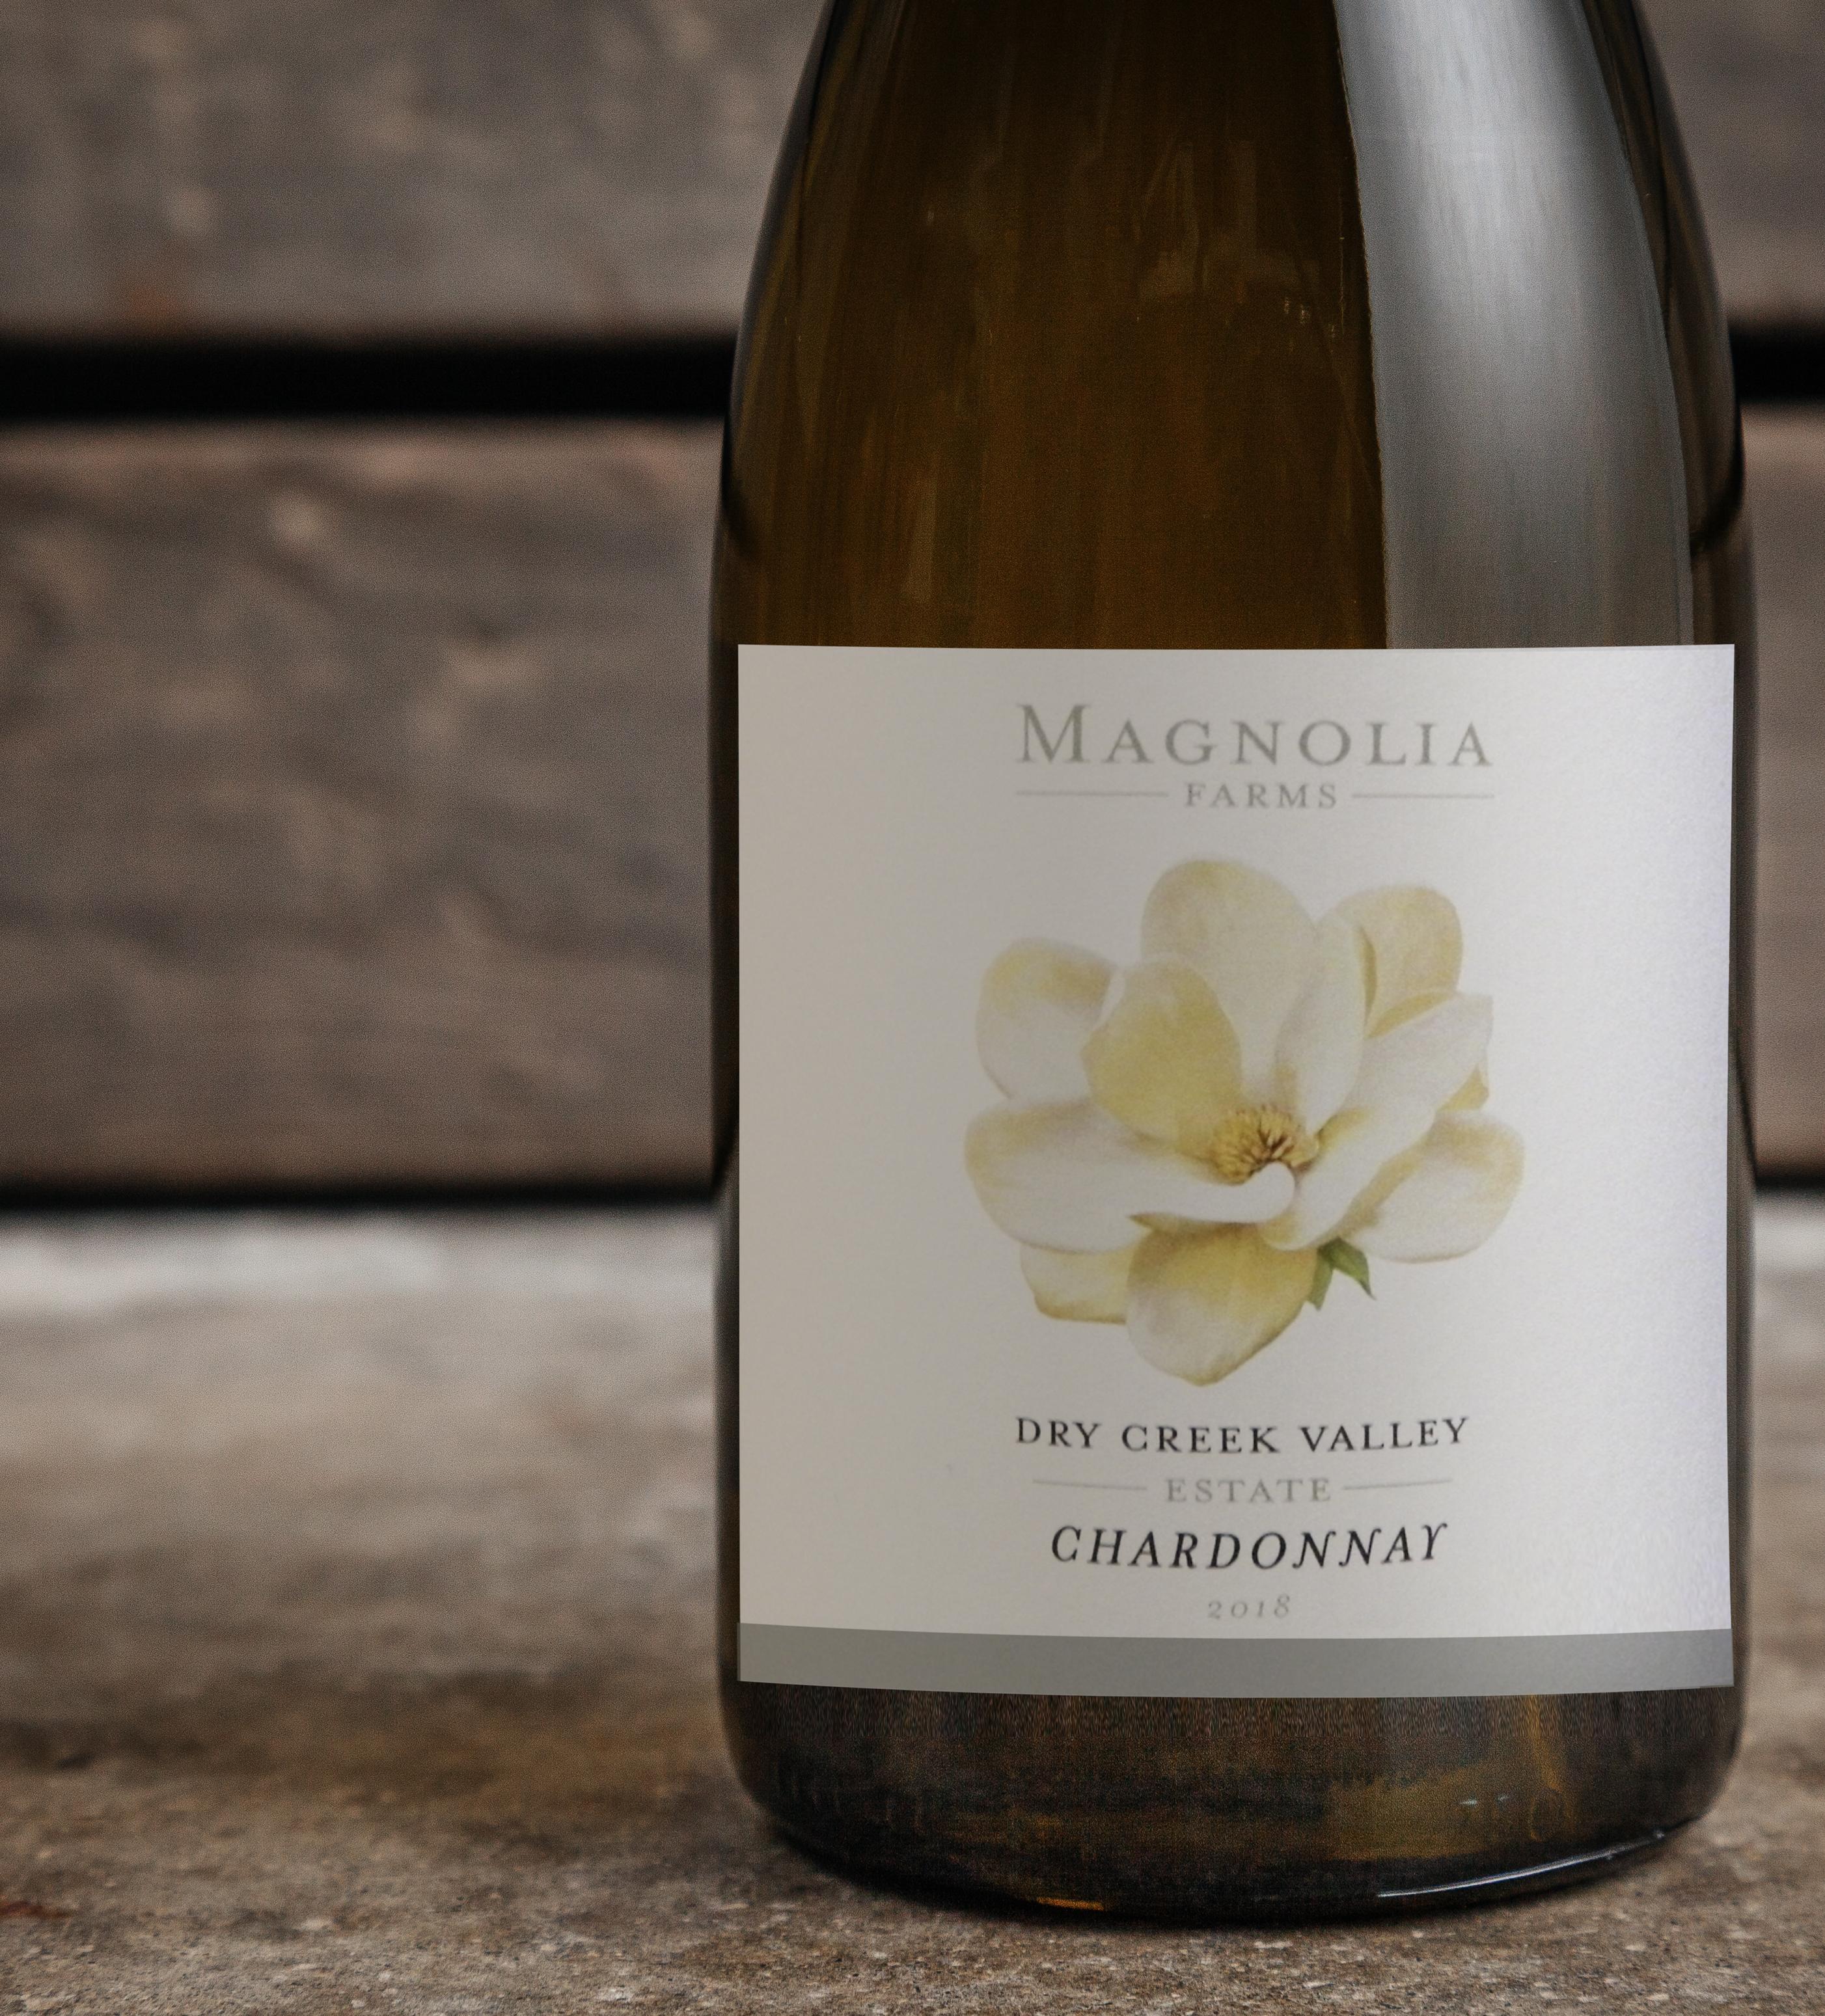 2018 Magnolia Farms Estate Dry Creek Valley Chardonnay